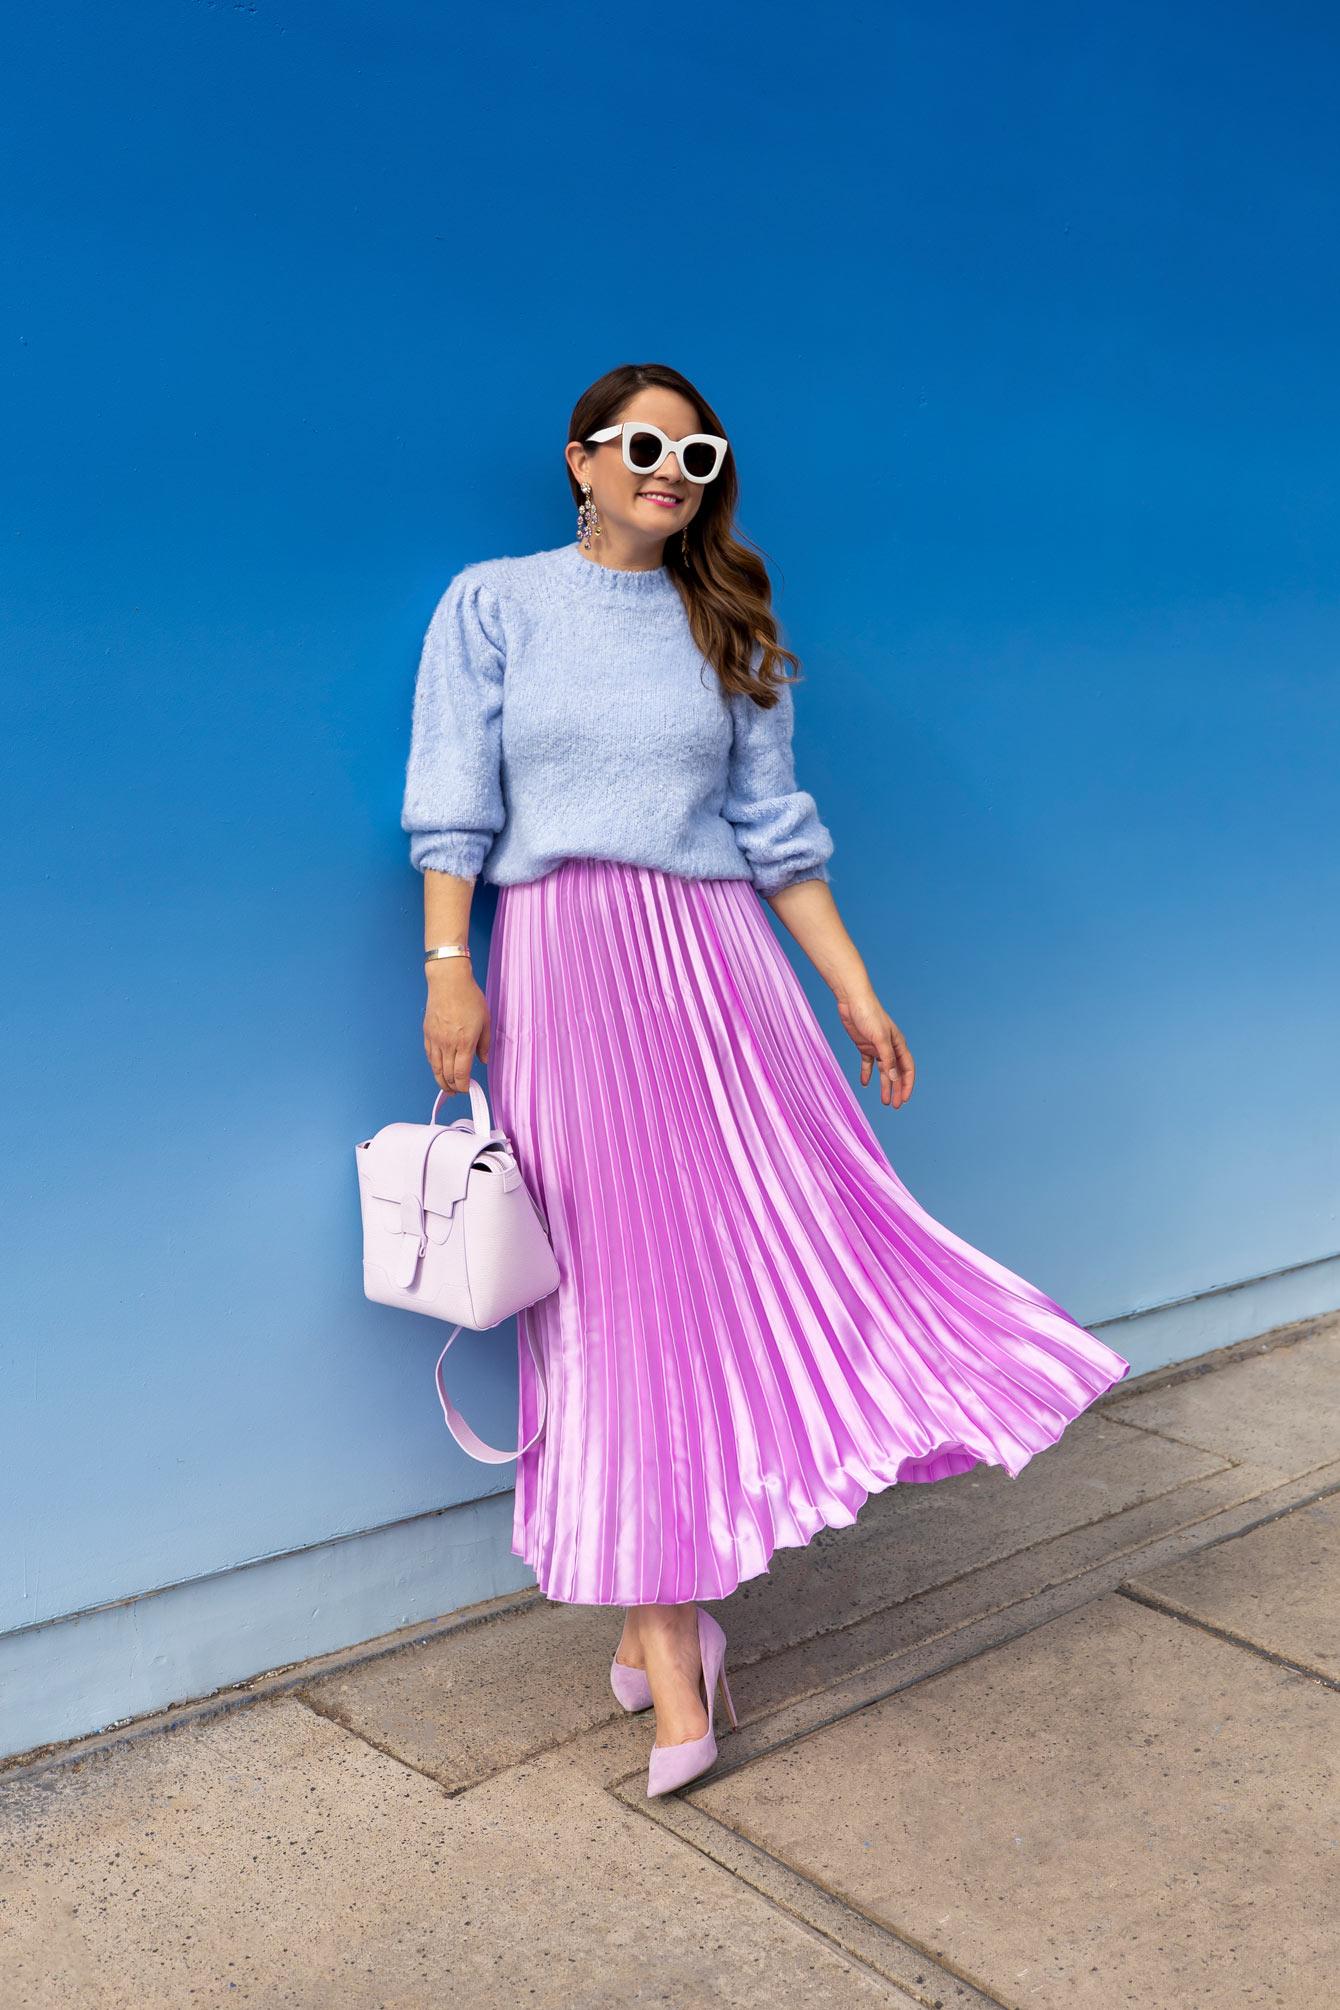 Sky Blue Lavender Outfit